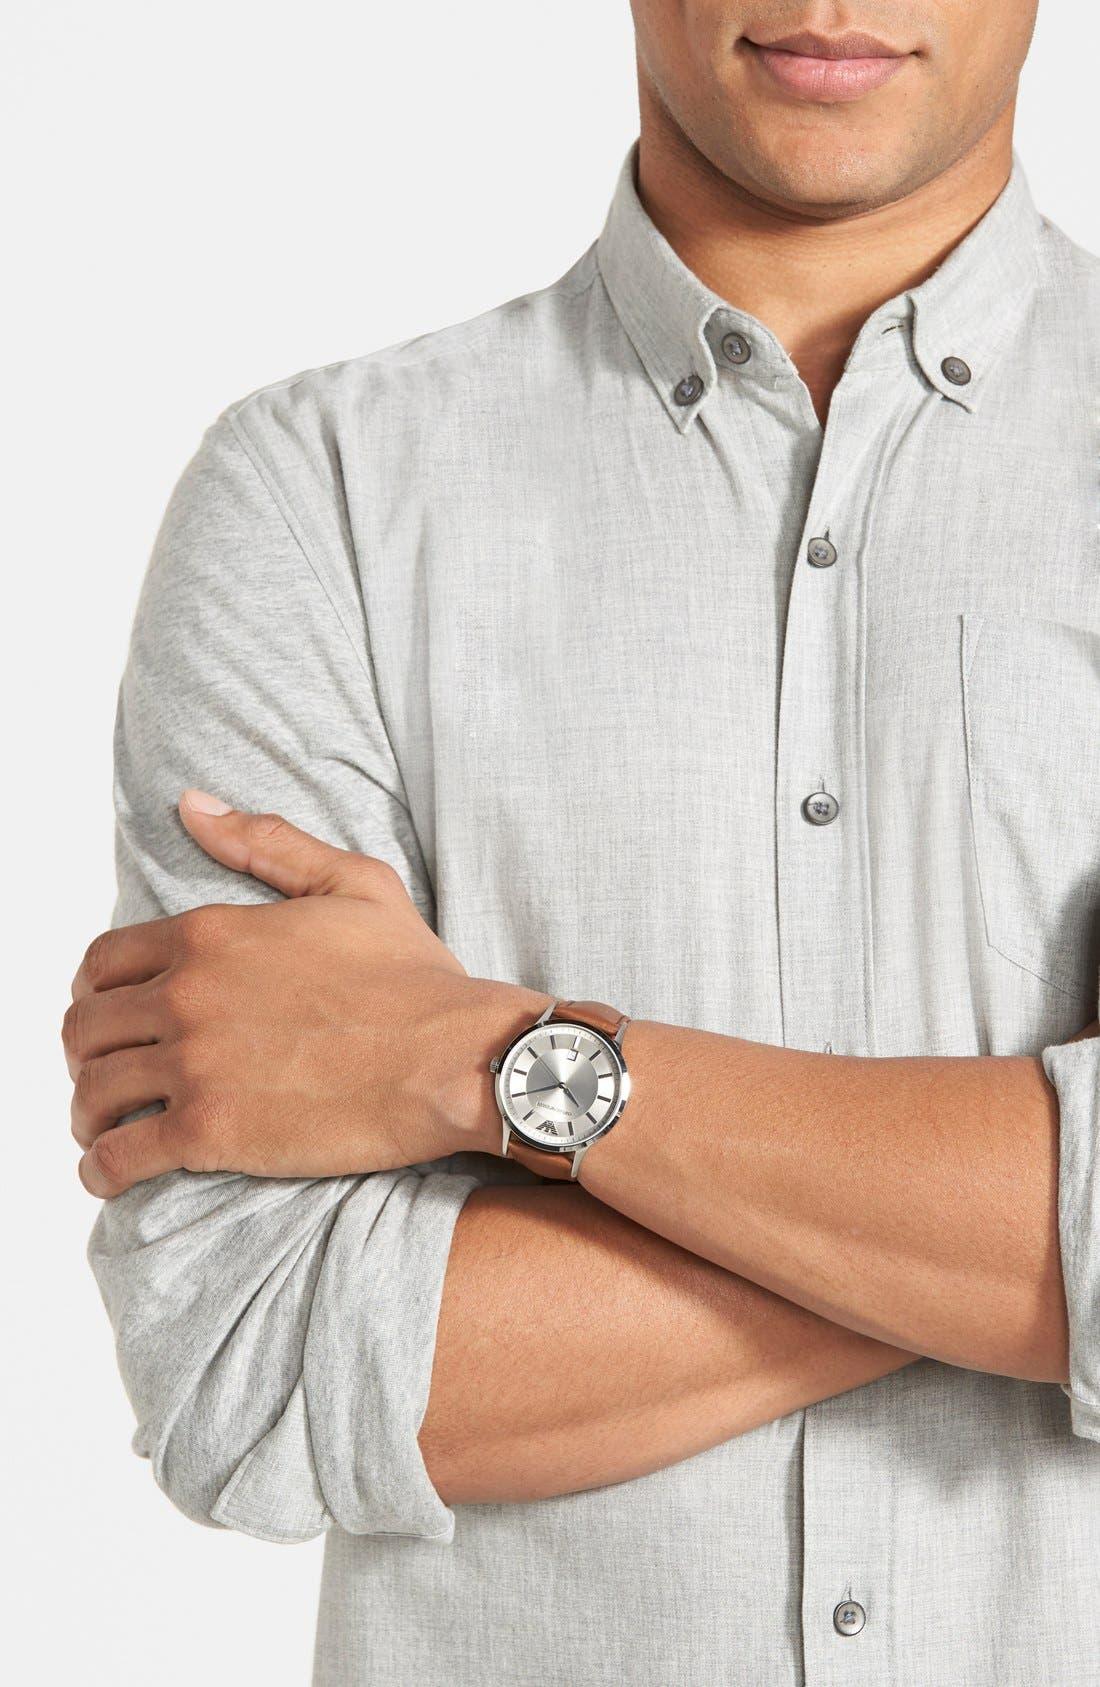 Alternate Image 3  - Emporio Armani Round Leather Strap Watch, 43mm